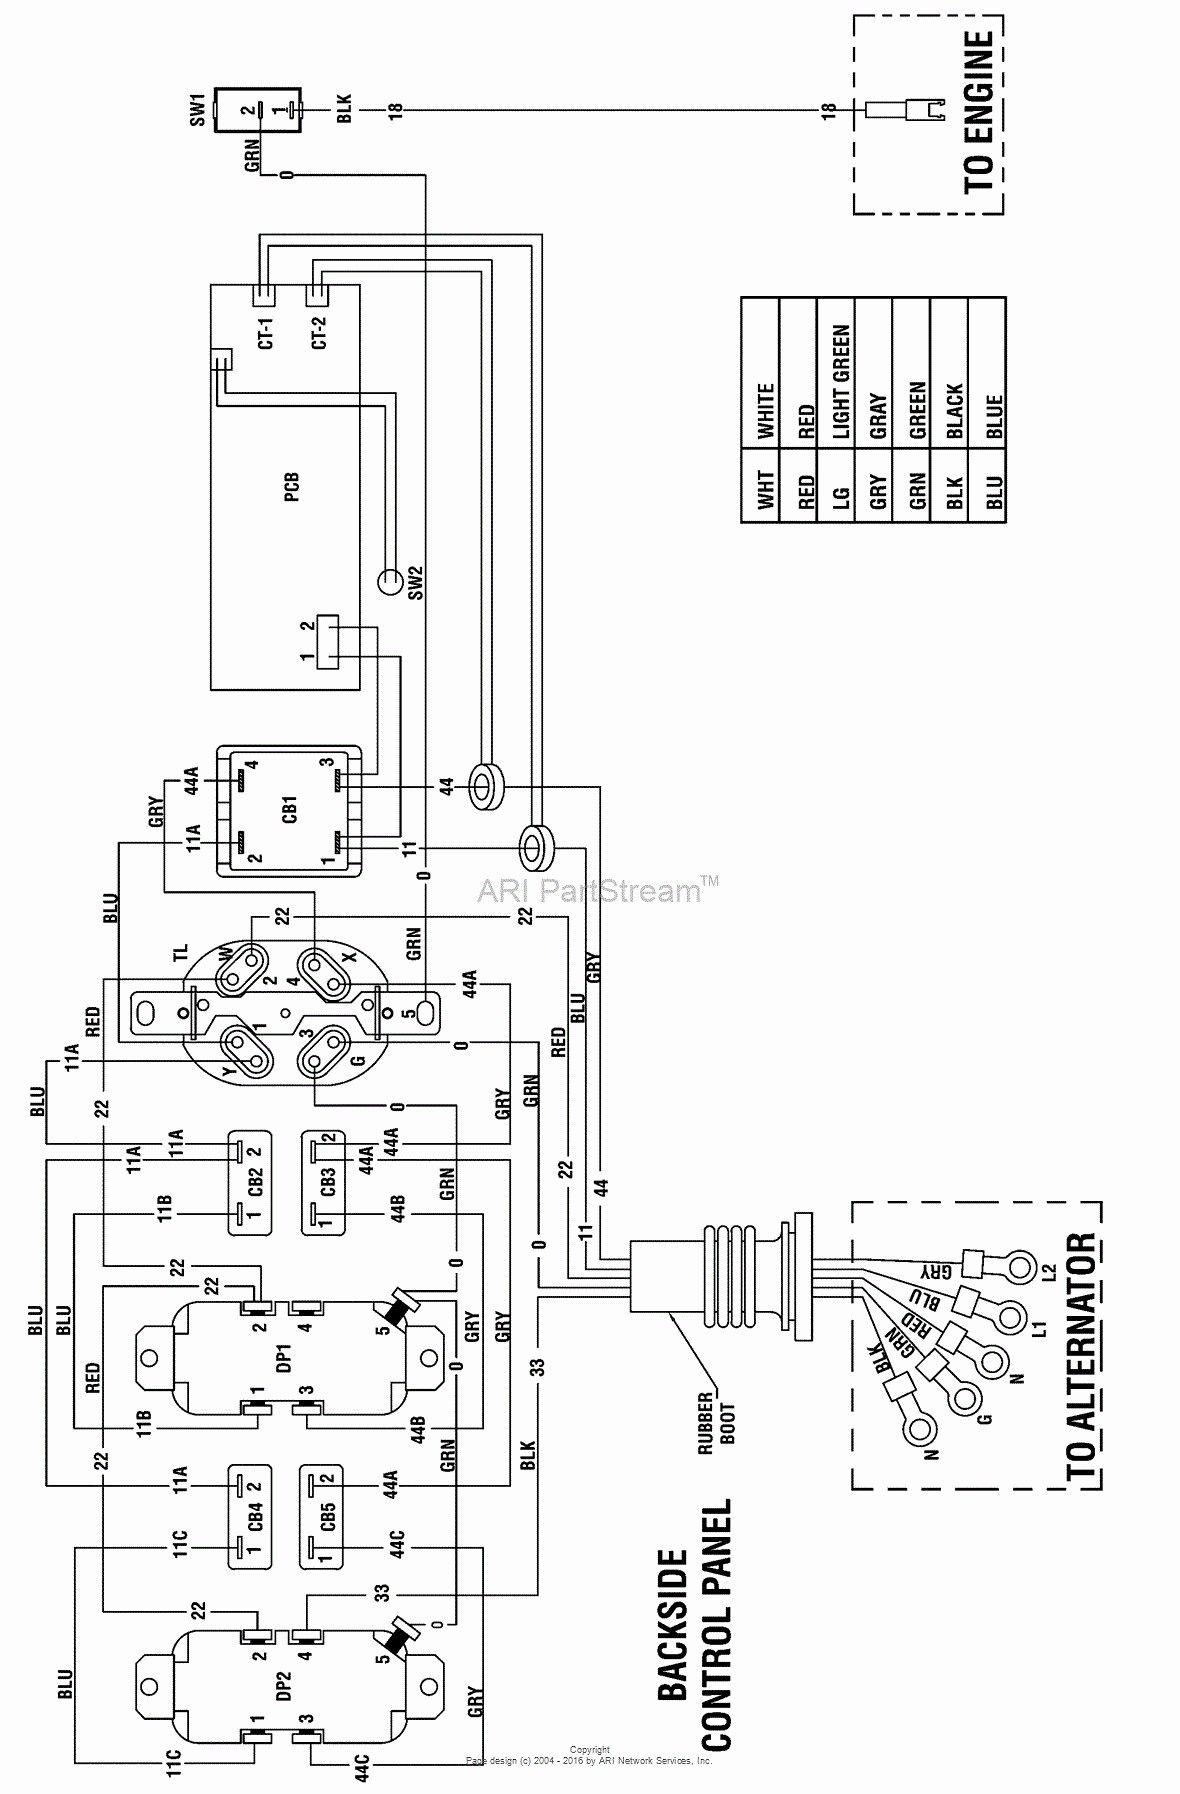 Unique Wiring Diagram Aircraft Magneto Con Imagenes